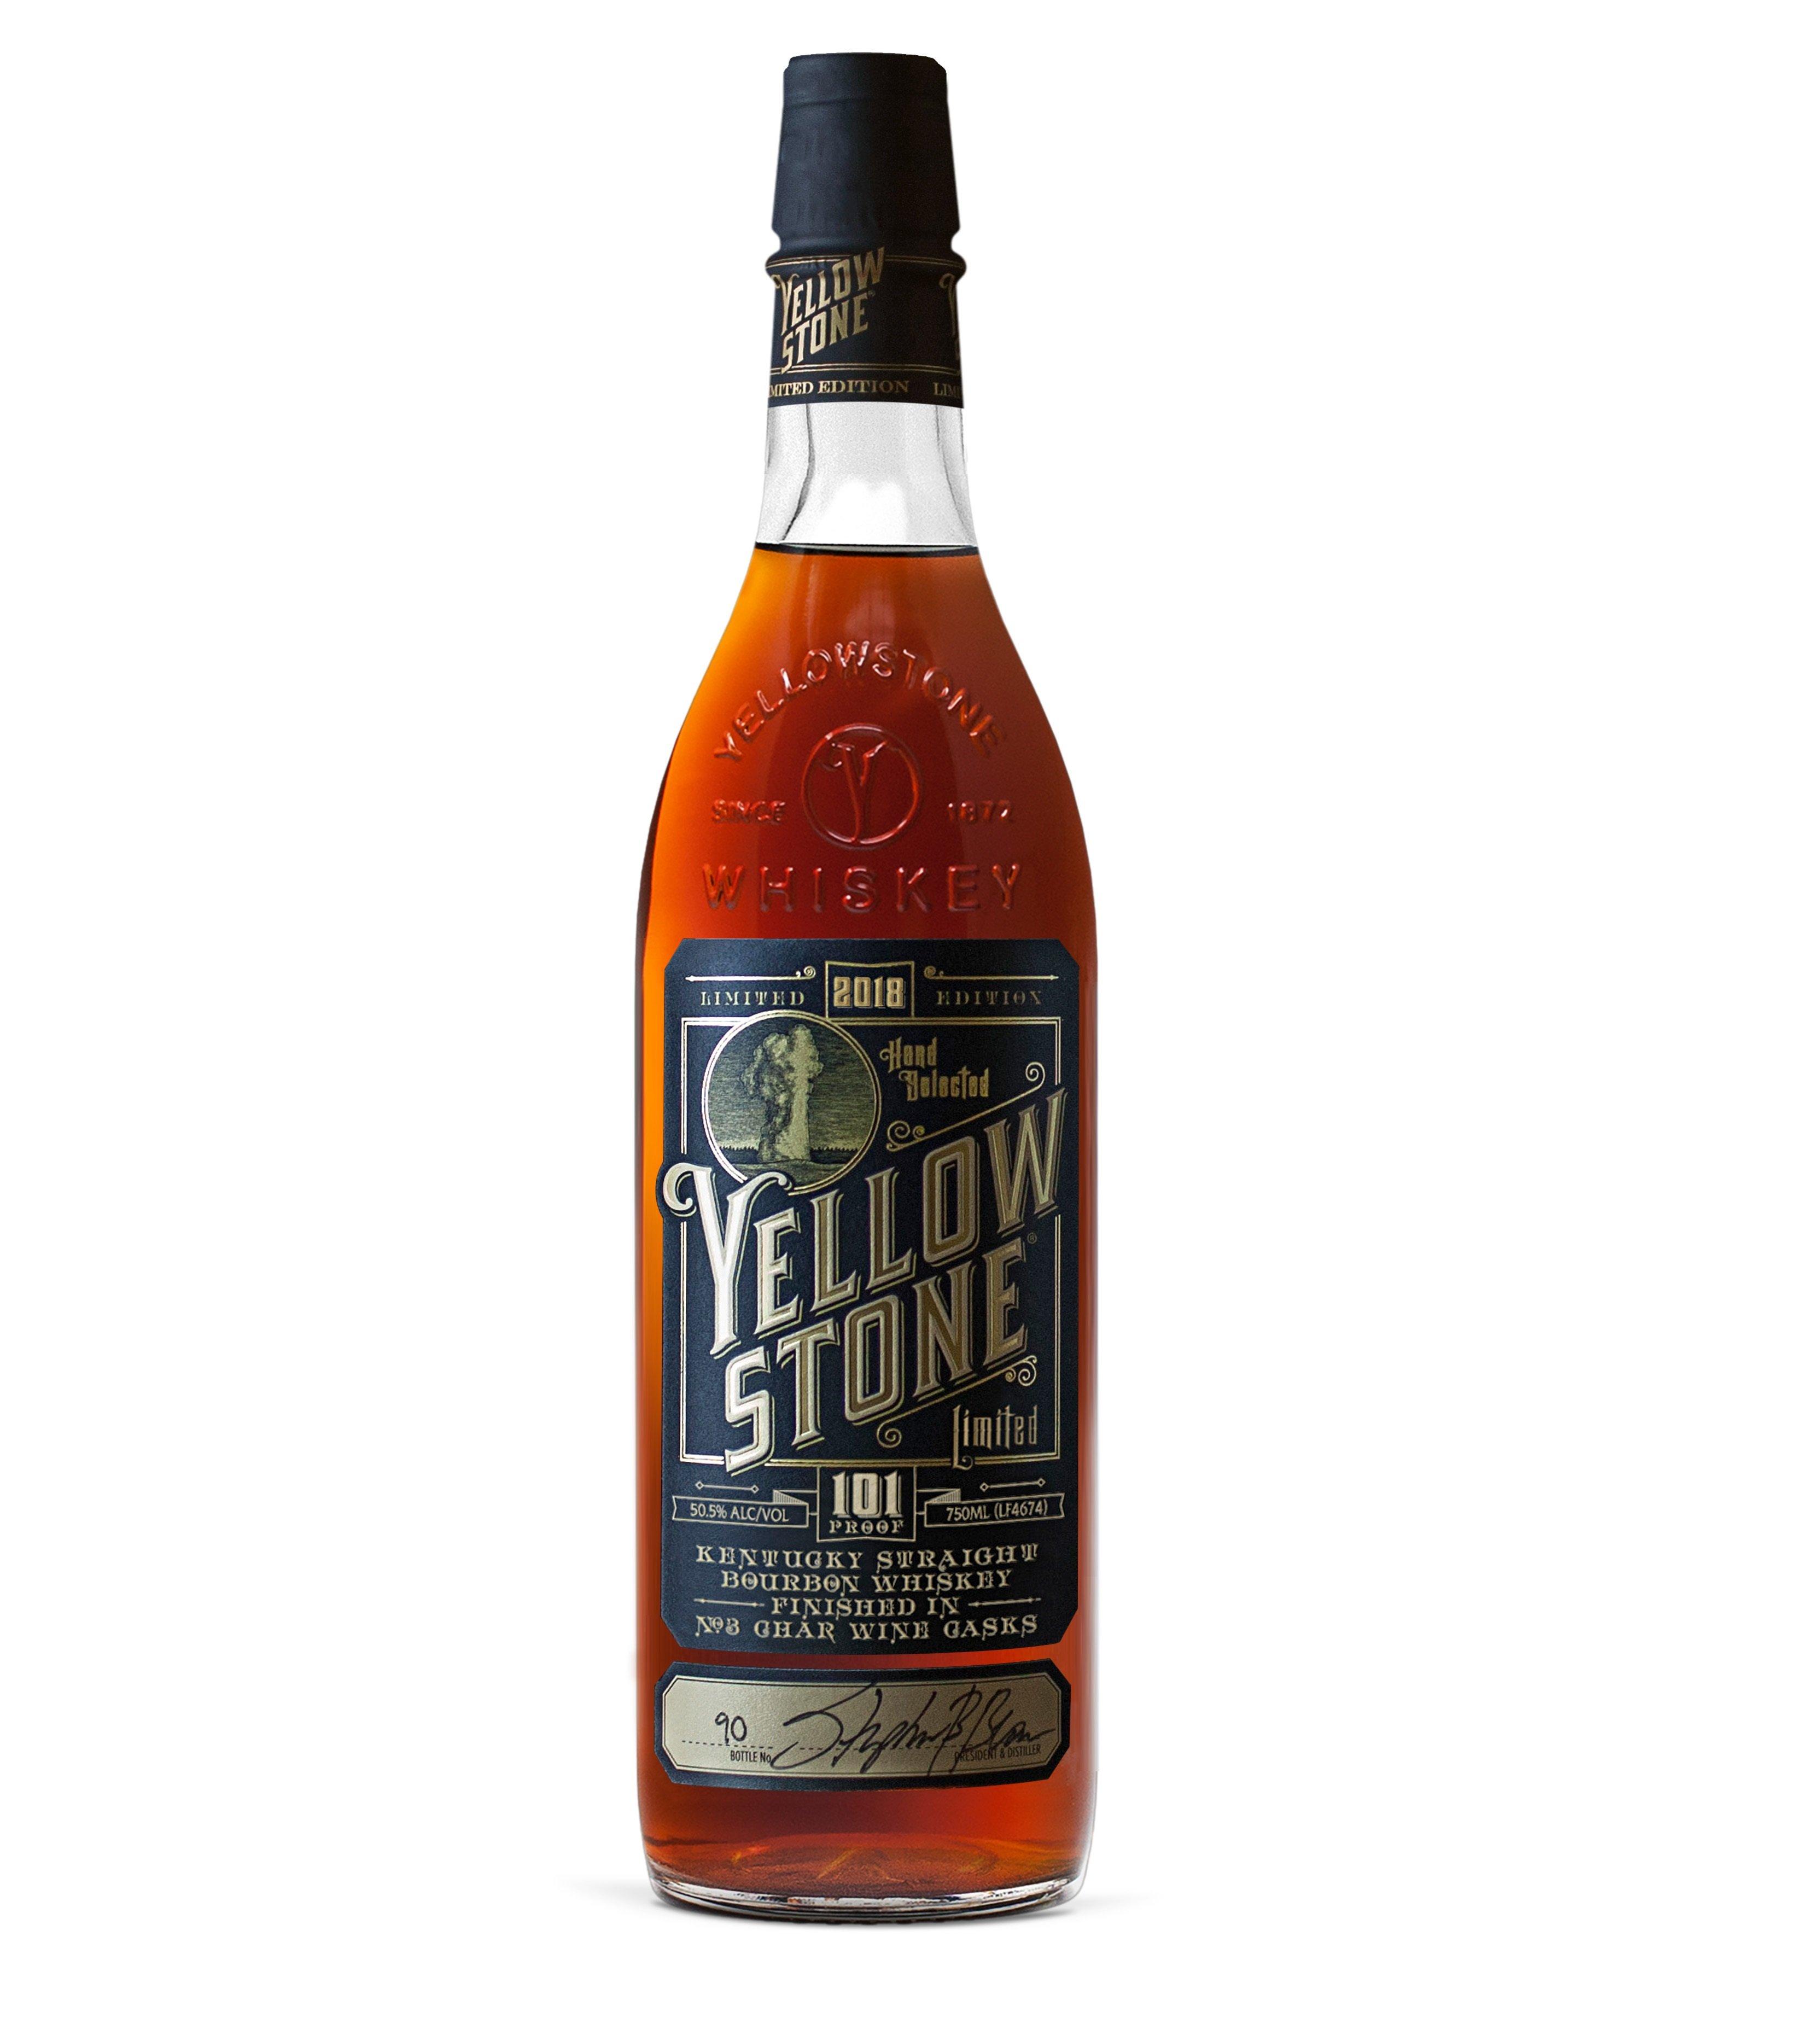 Yellowstone Limited Edition Kentucky Straight Bourbon 2018